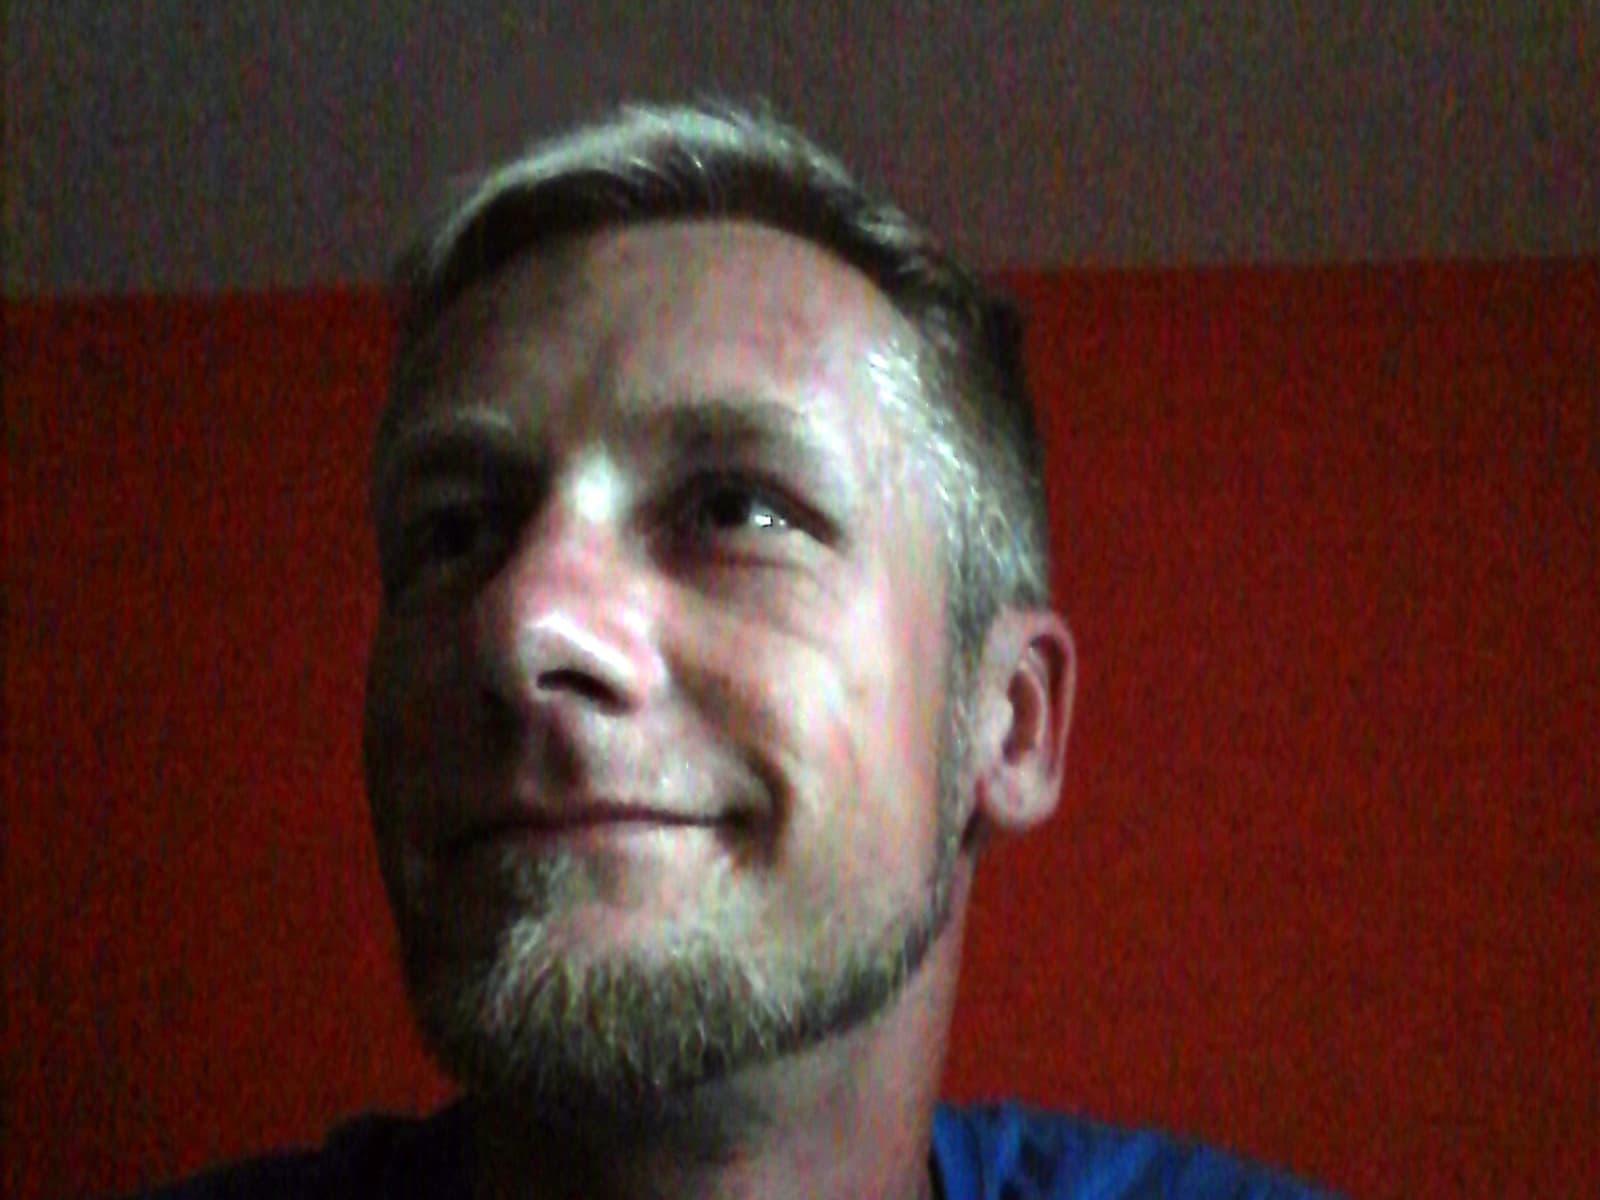 Thomas from Rostock, Germany